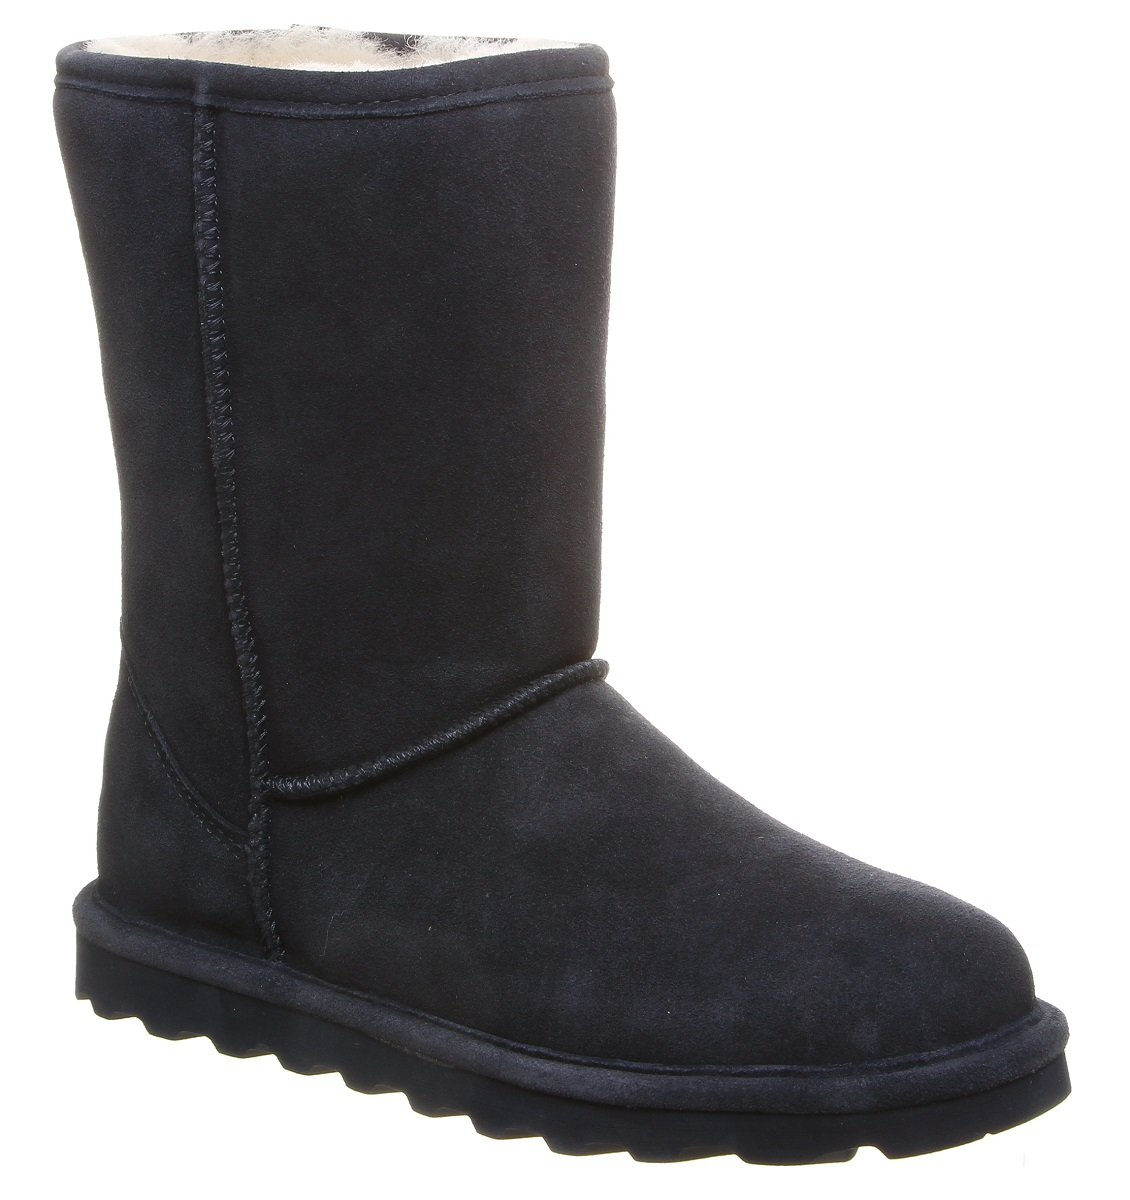 BEARPAW Women's Elle Short Fashion Boot B079CBP5BJ 6 B(M) US|Navy